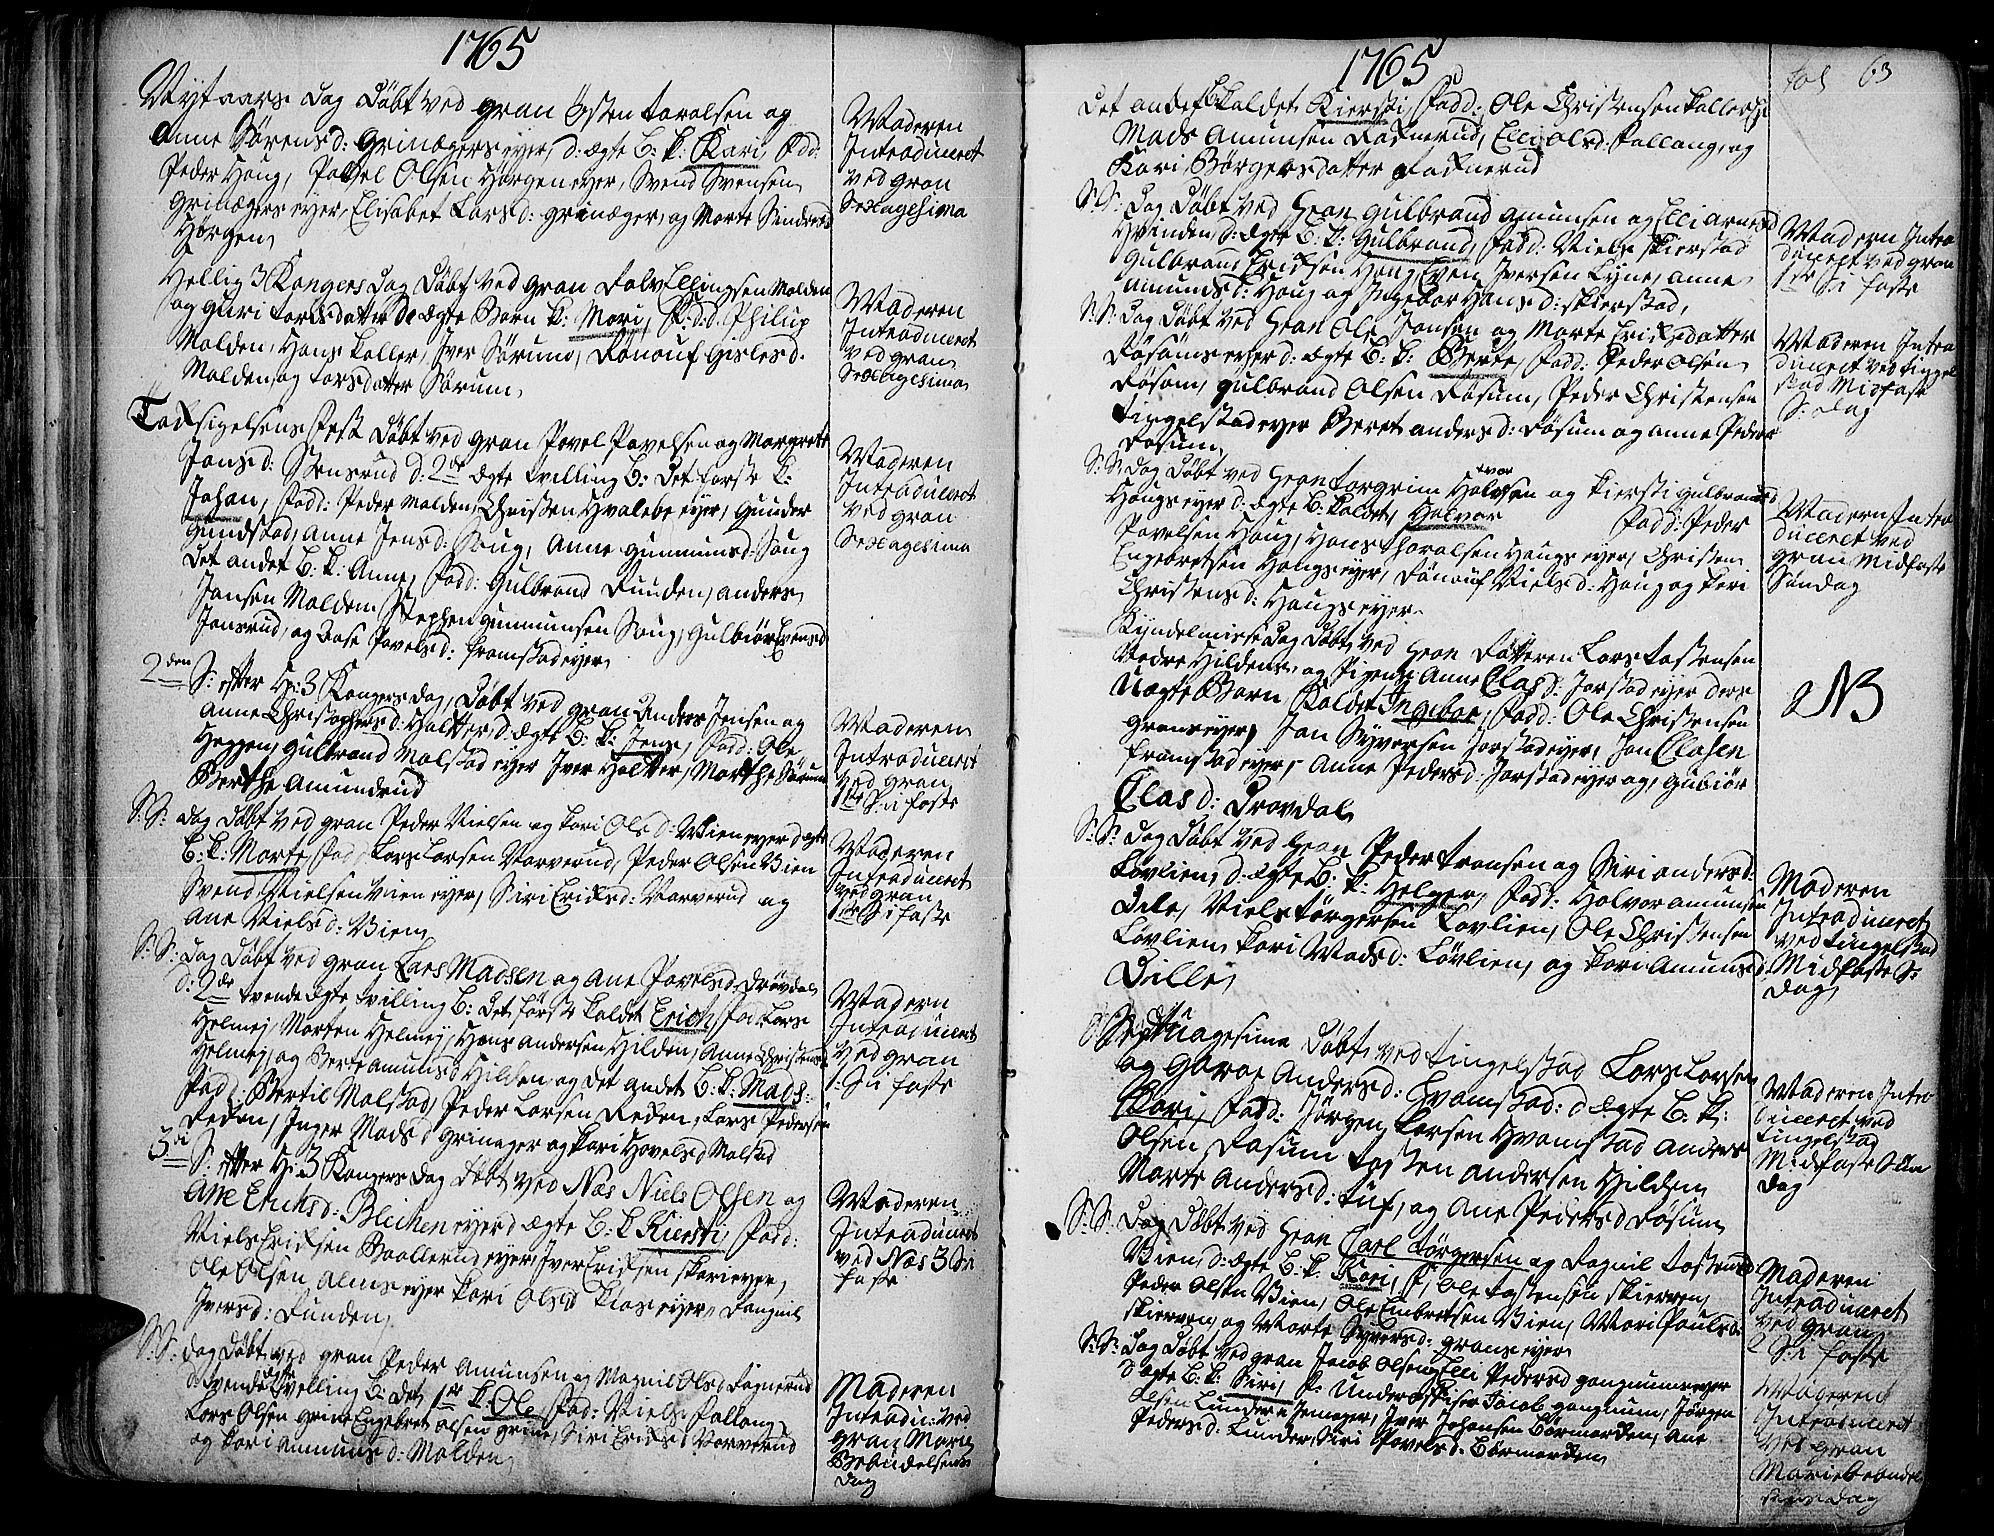 SAH, Gran prestekontor, Ministerialbok nr. 4, 1759-1775, s. 63